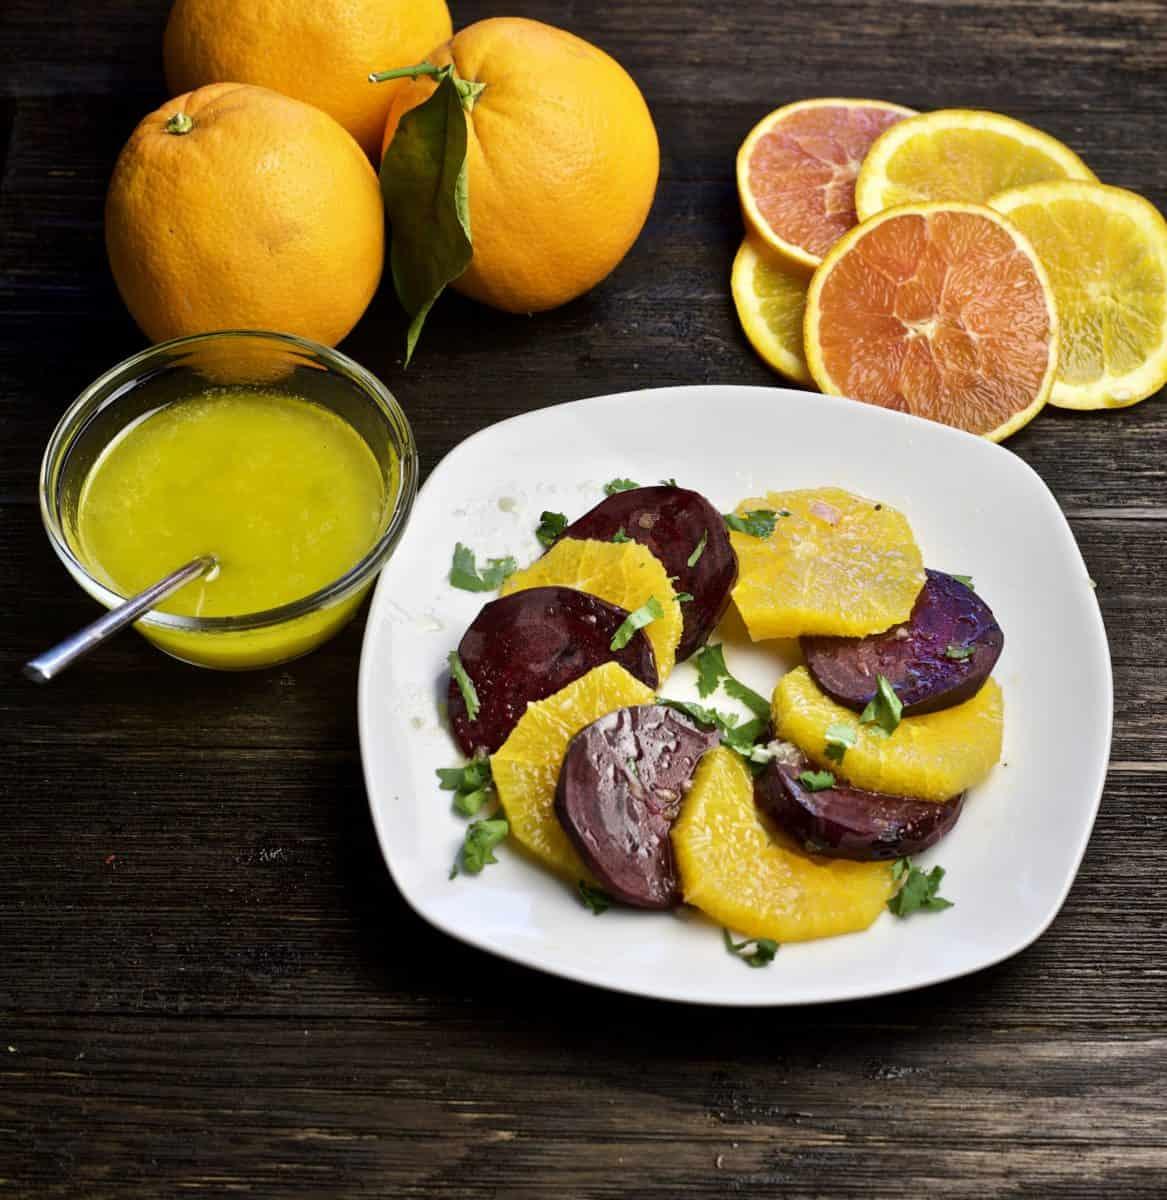 beet and orange salad with citrus vinaigrette on side and sliced oranges in top corner